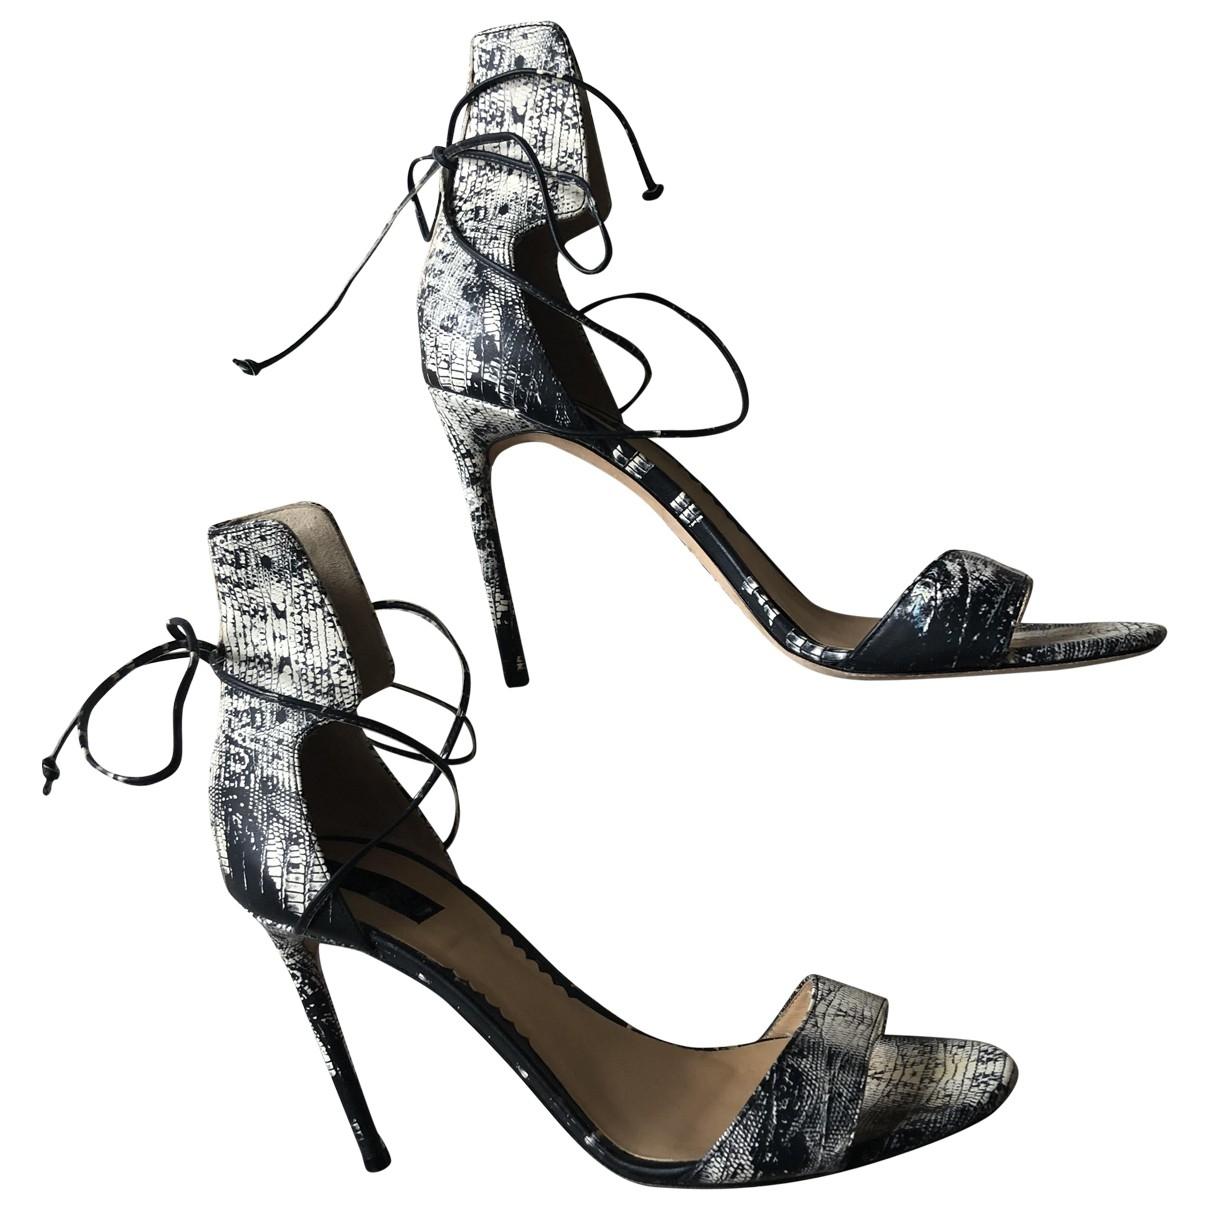 Reed Krakoff - Sandales   pour femme en cuir - multicolore